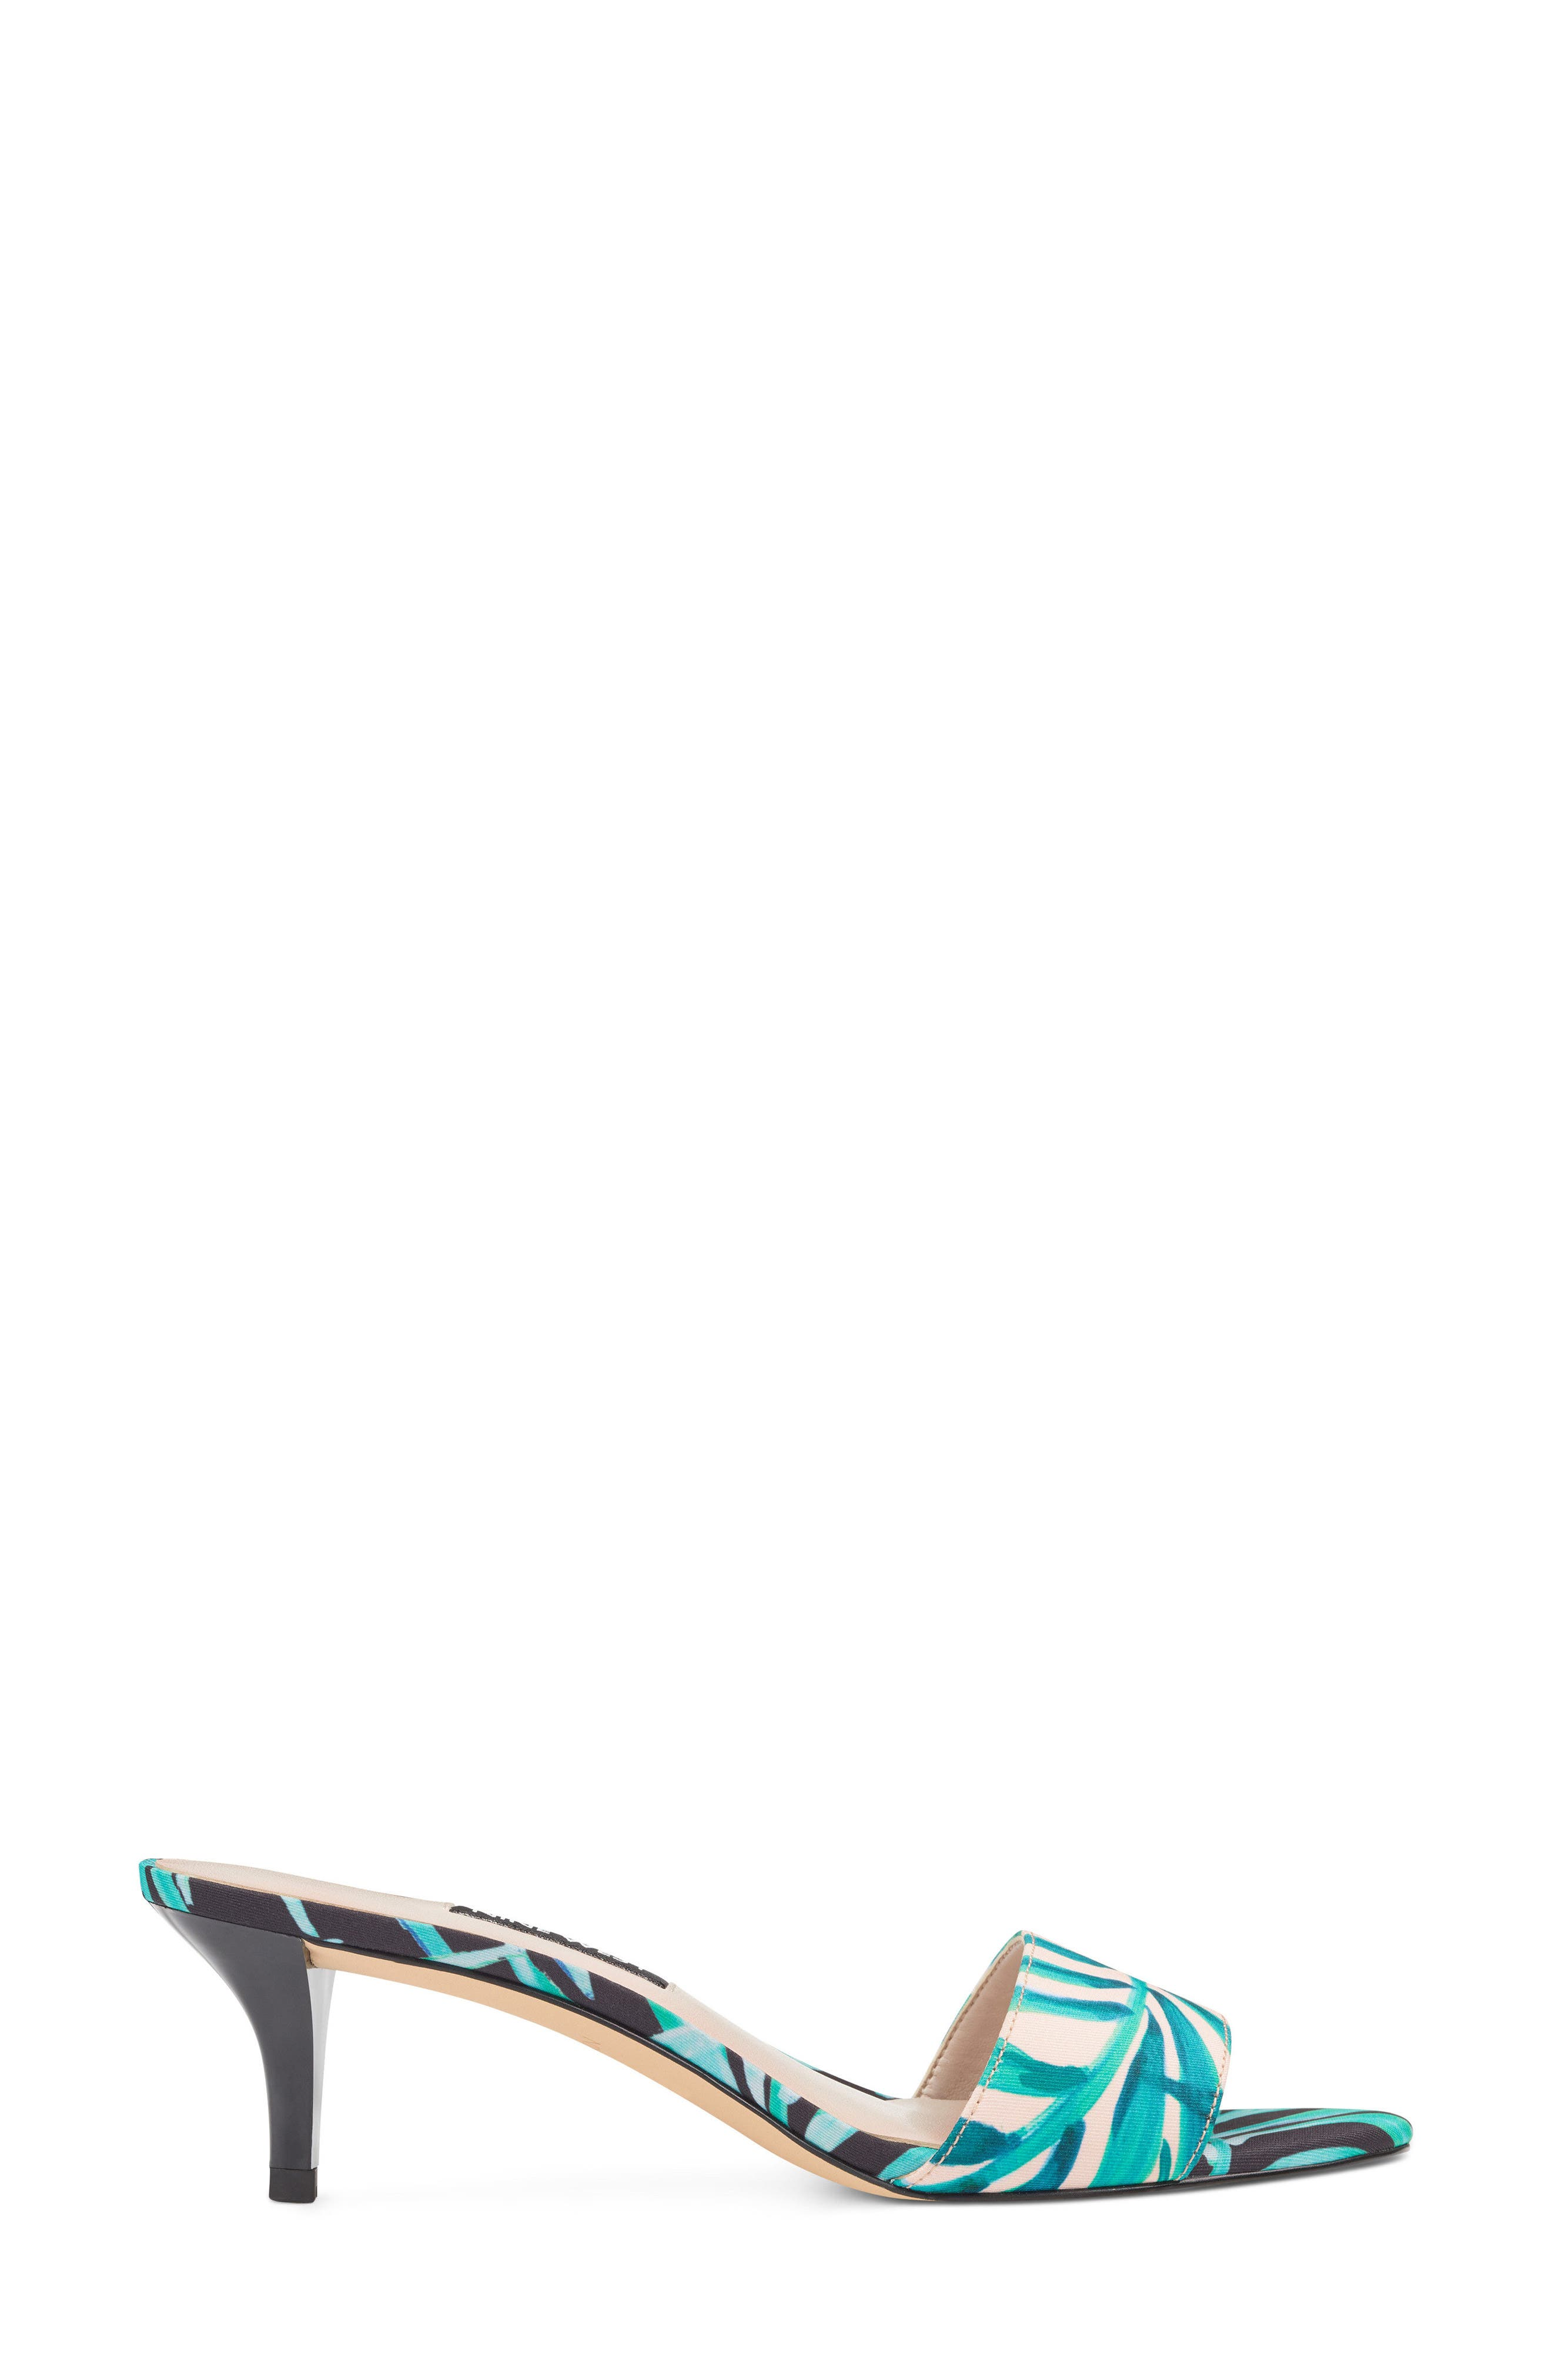 Lynton Sandal,                             Alternate thumbnail 3, color,                             Pink Multi Fabric